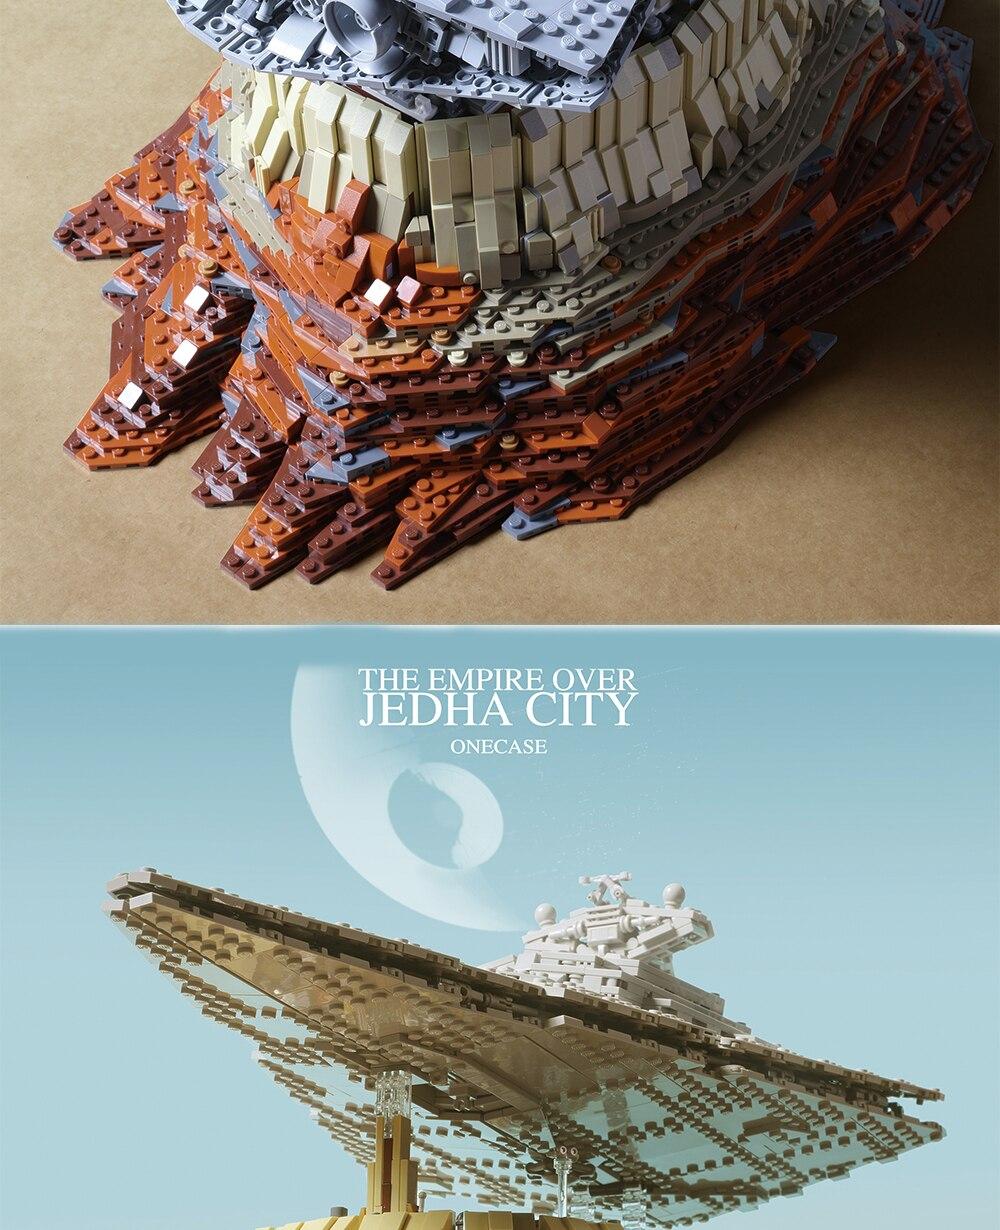 lego The Empire over Jedha City (4)